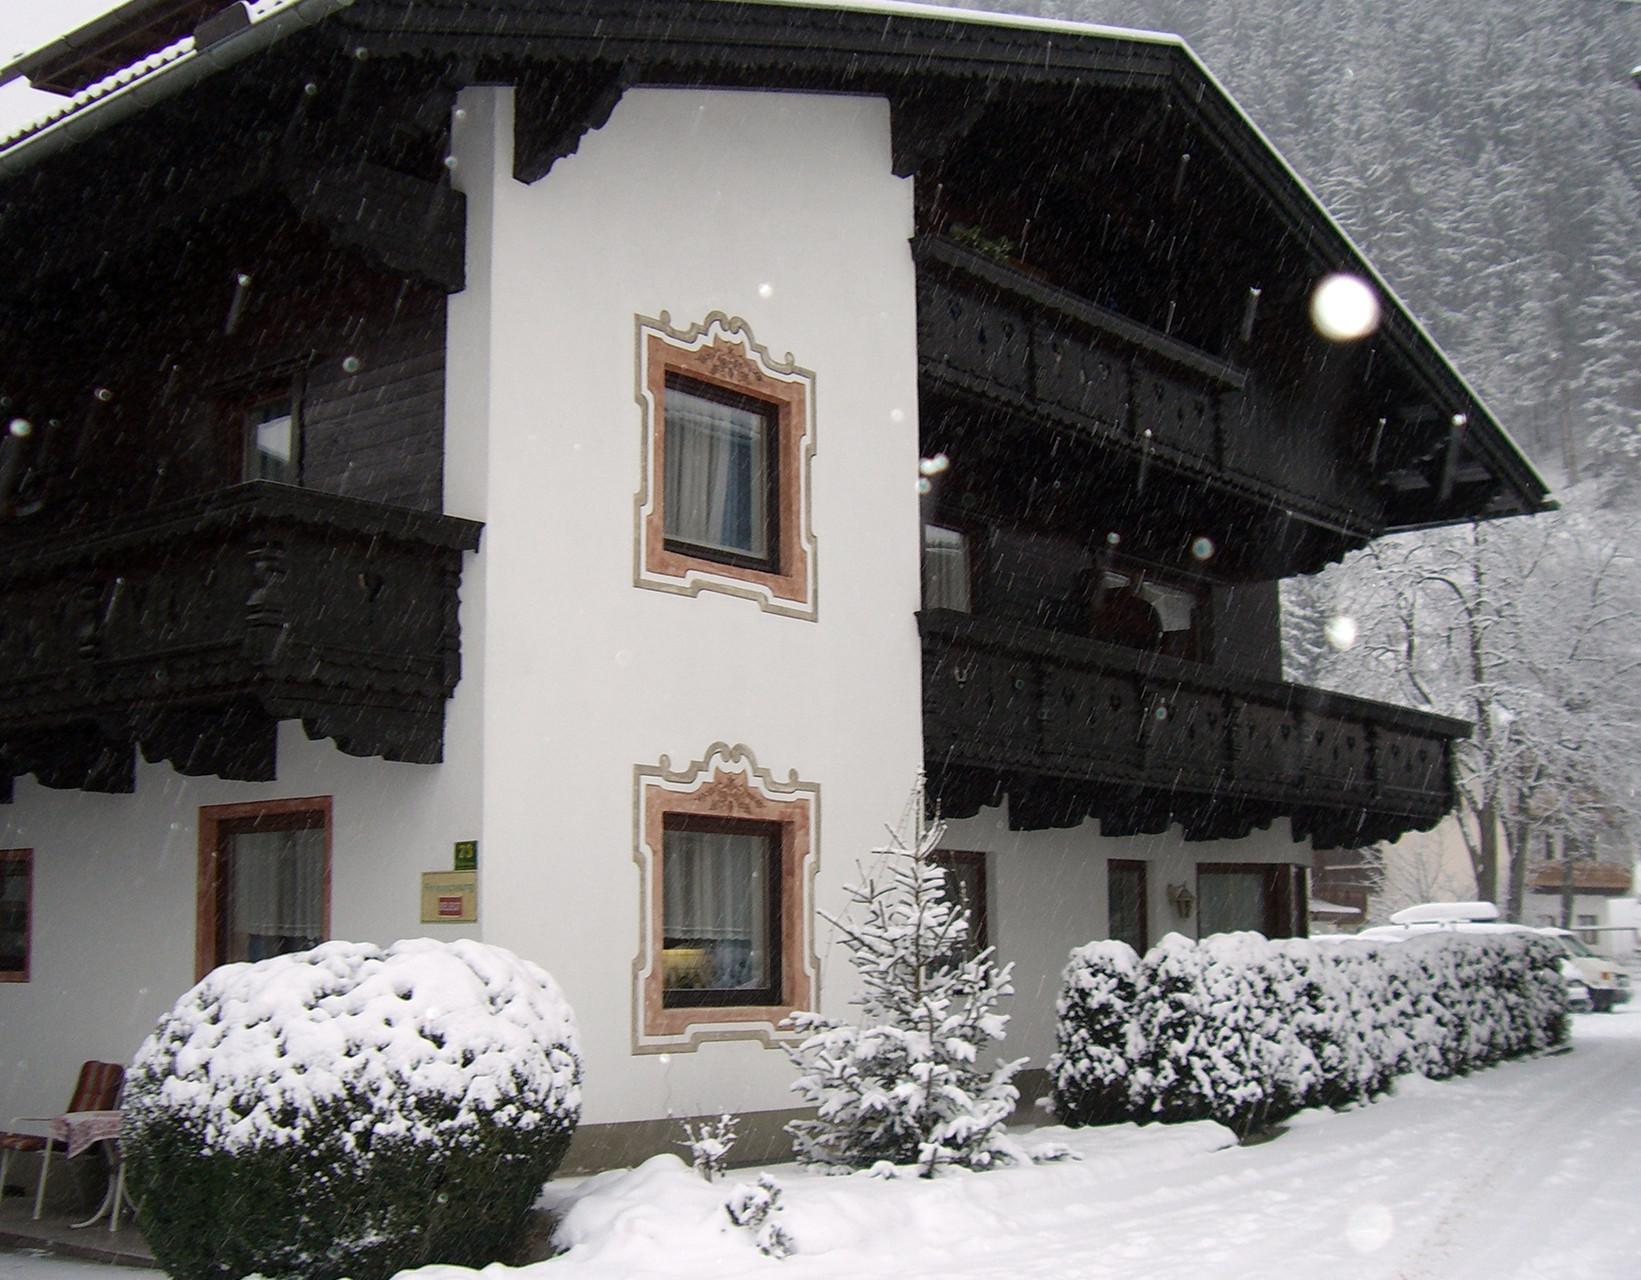 Appartmenthaus im Winter